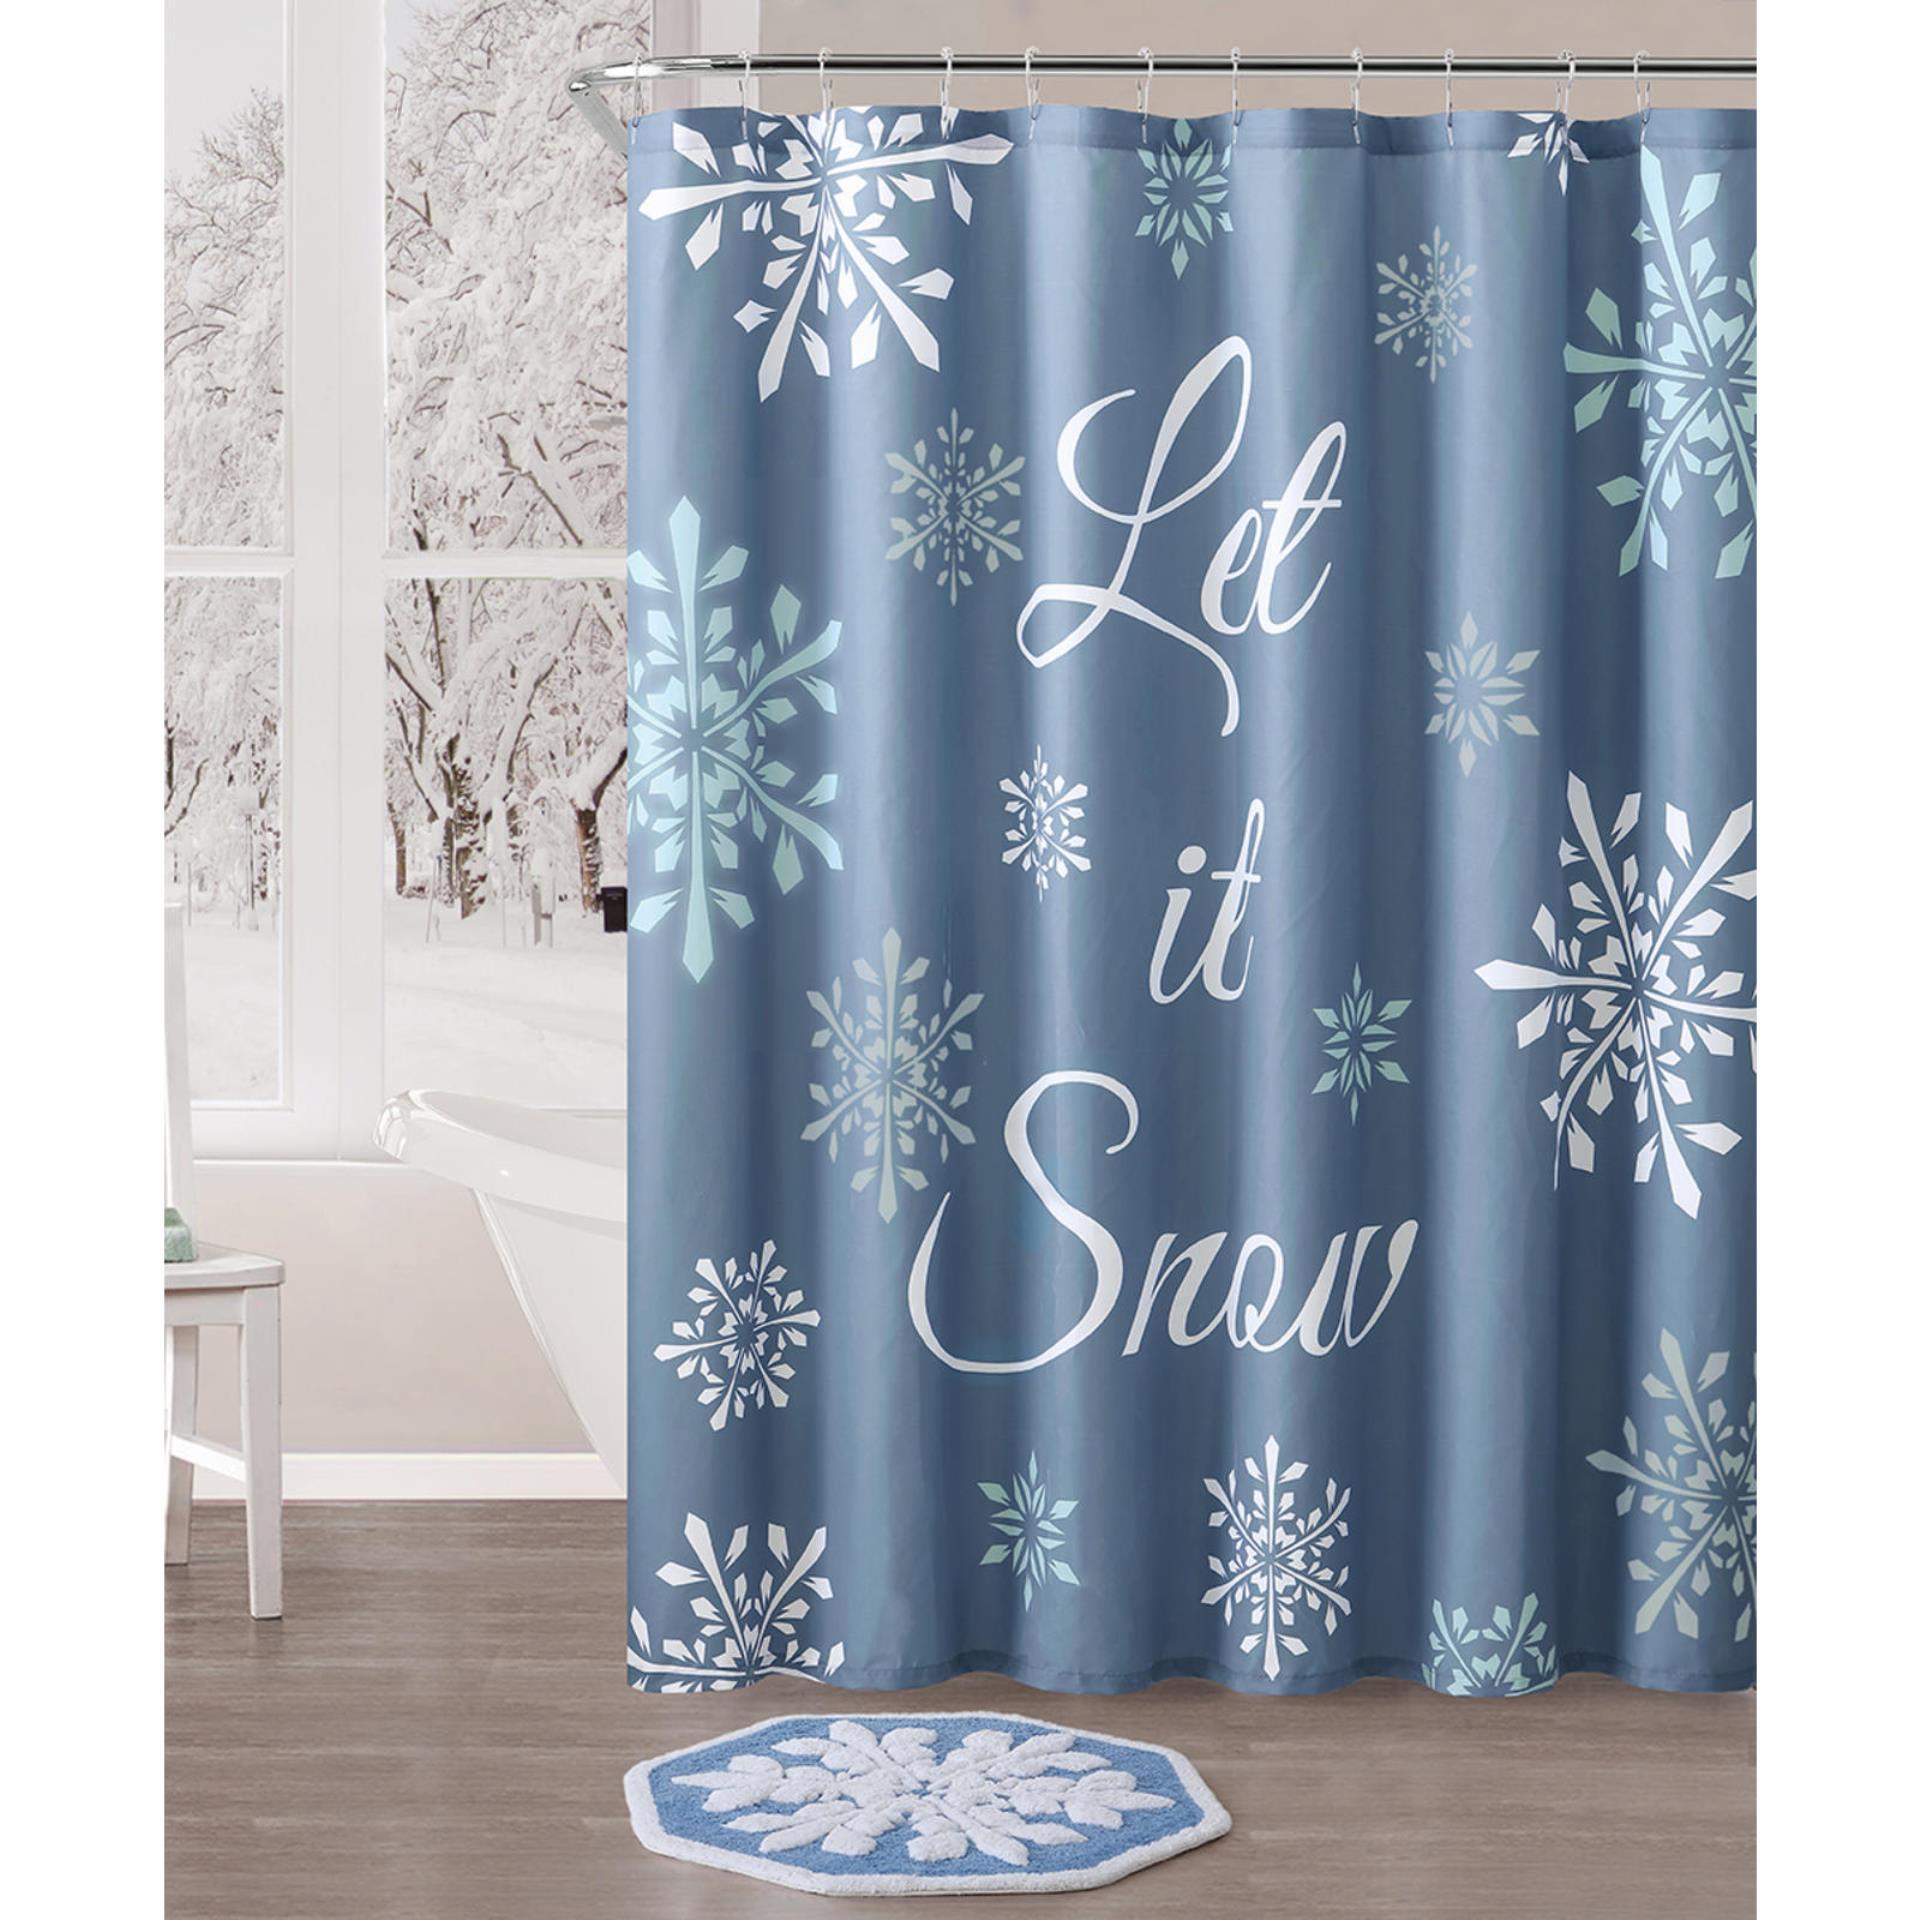 Let It Snow 72 X 72 Shower Curtain Home Bed Bath Bath Bathroom Accessories Bath